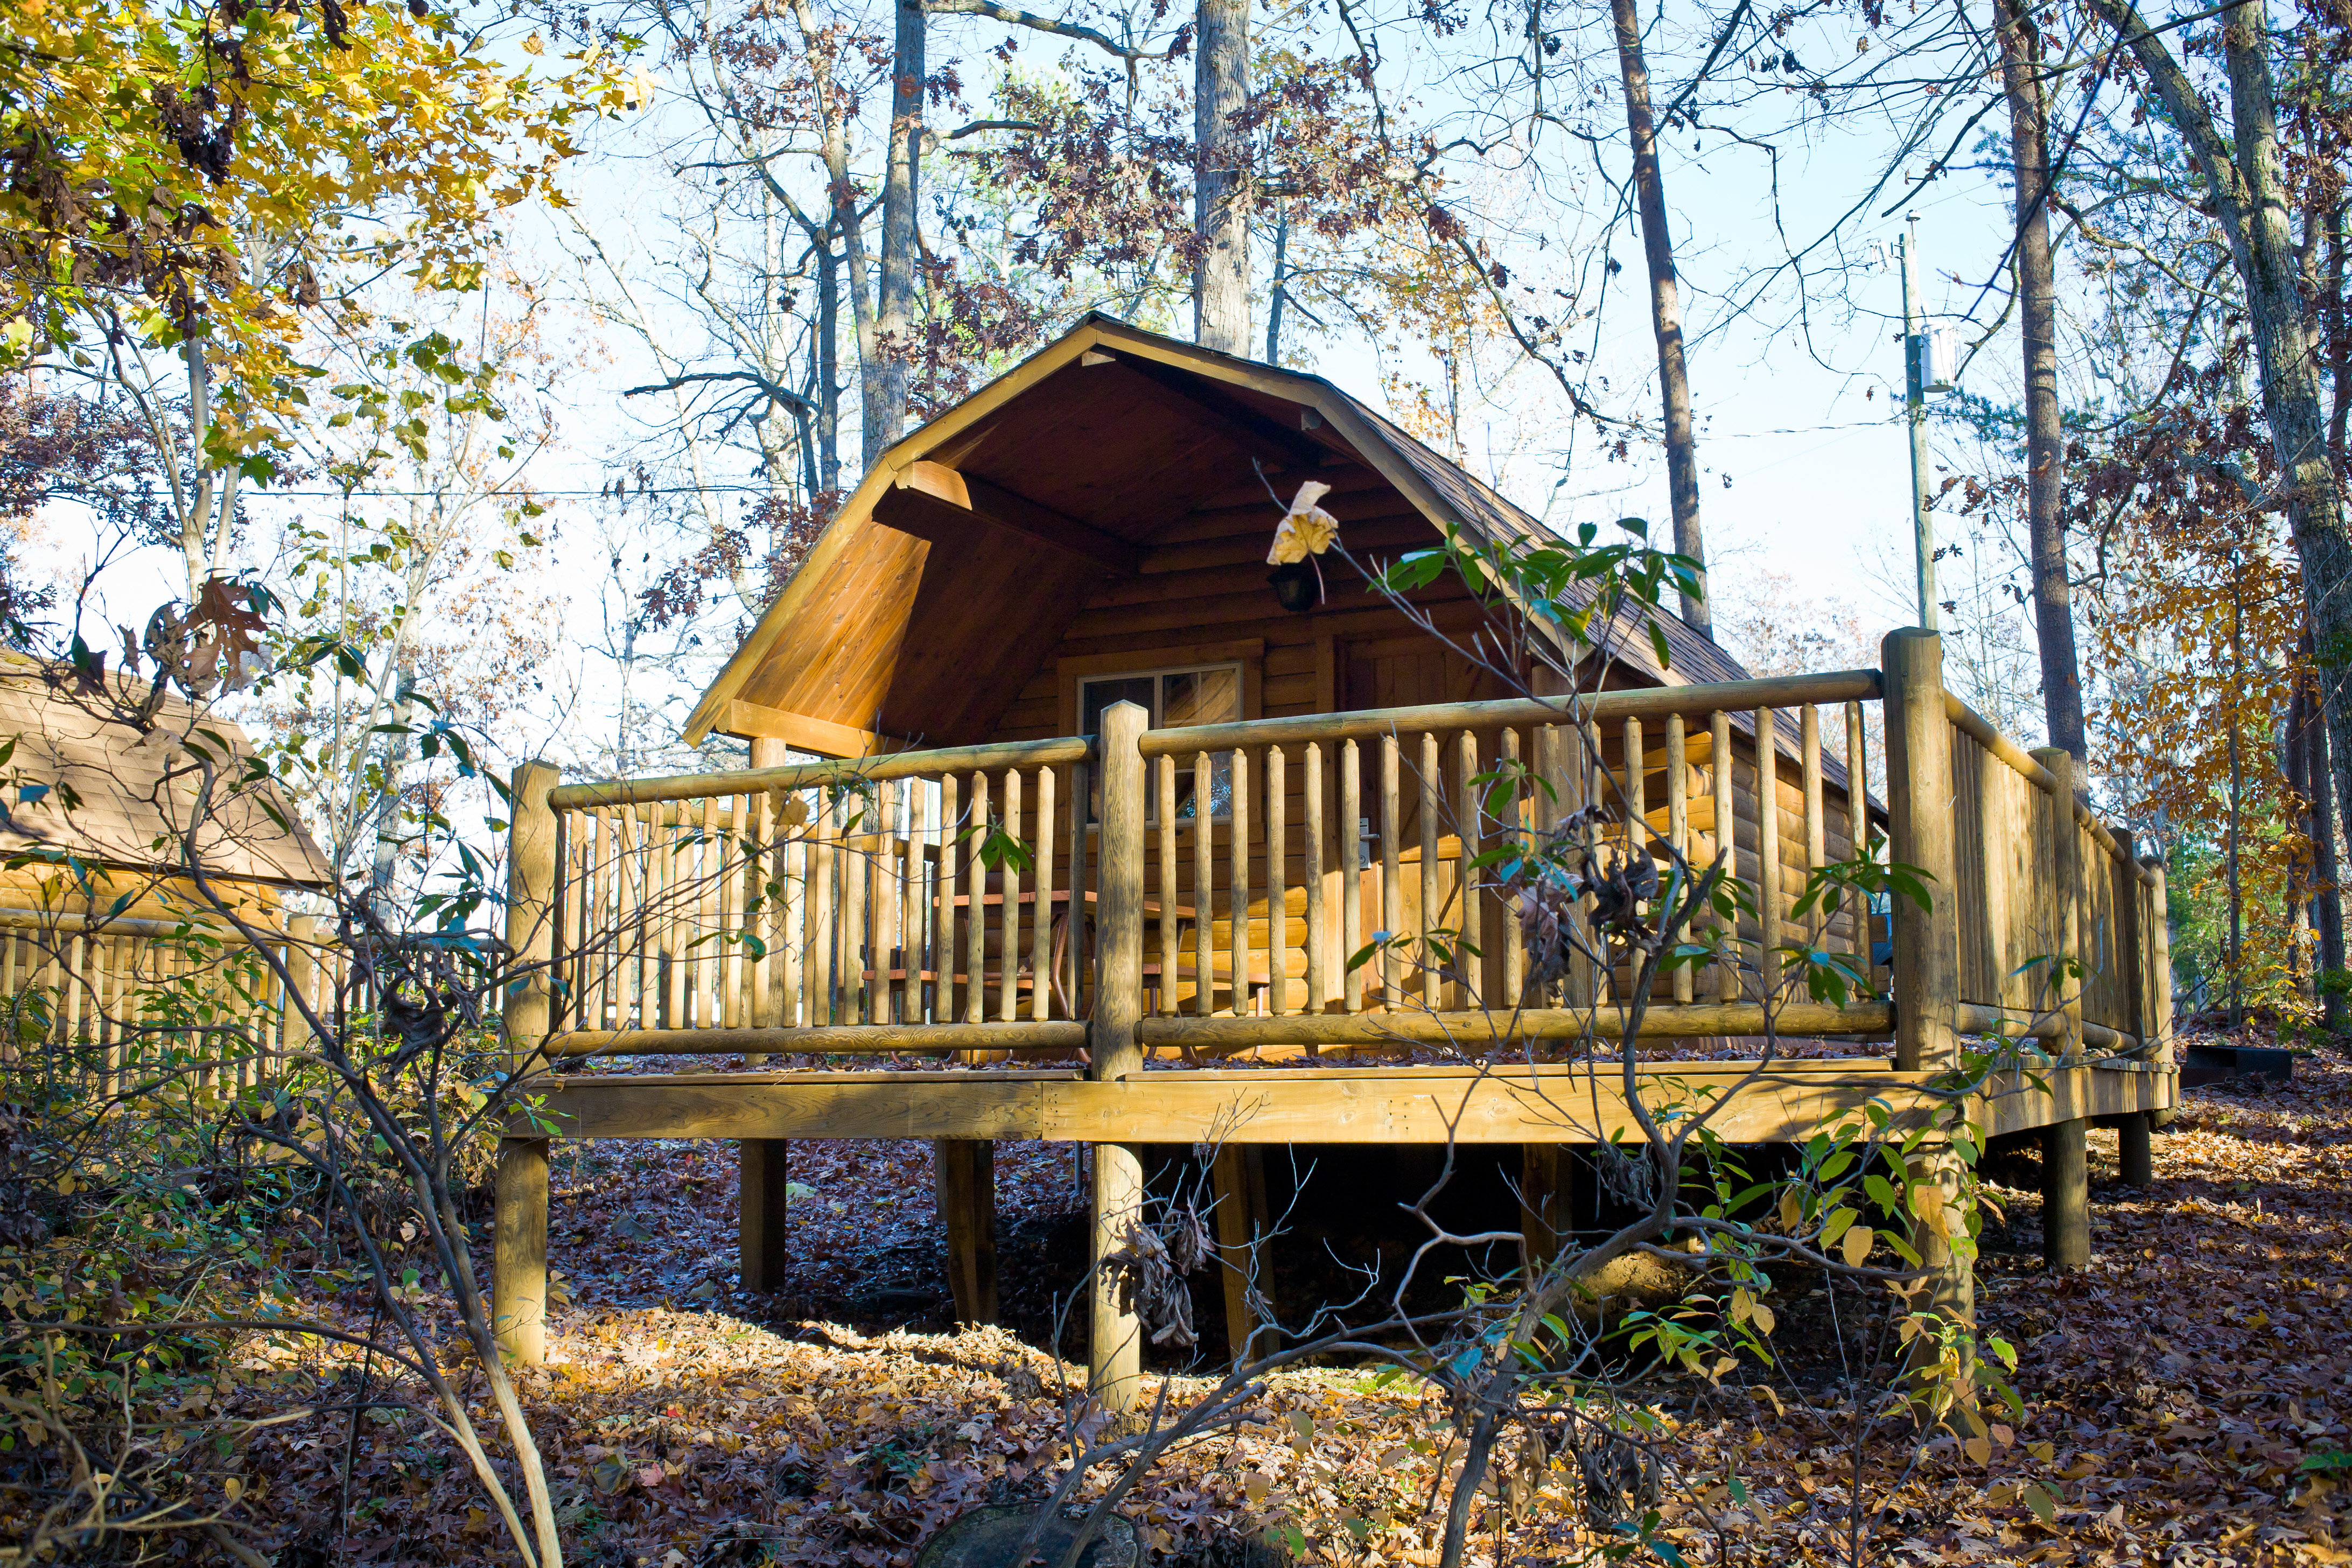 ridge mountains cabins rentals blue vacation pet in mountain georgia nc va luxury boone virginia cabin friendly